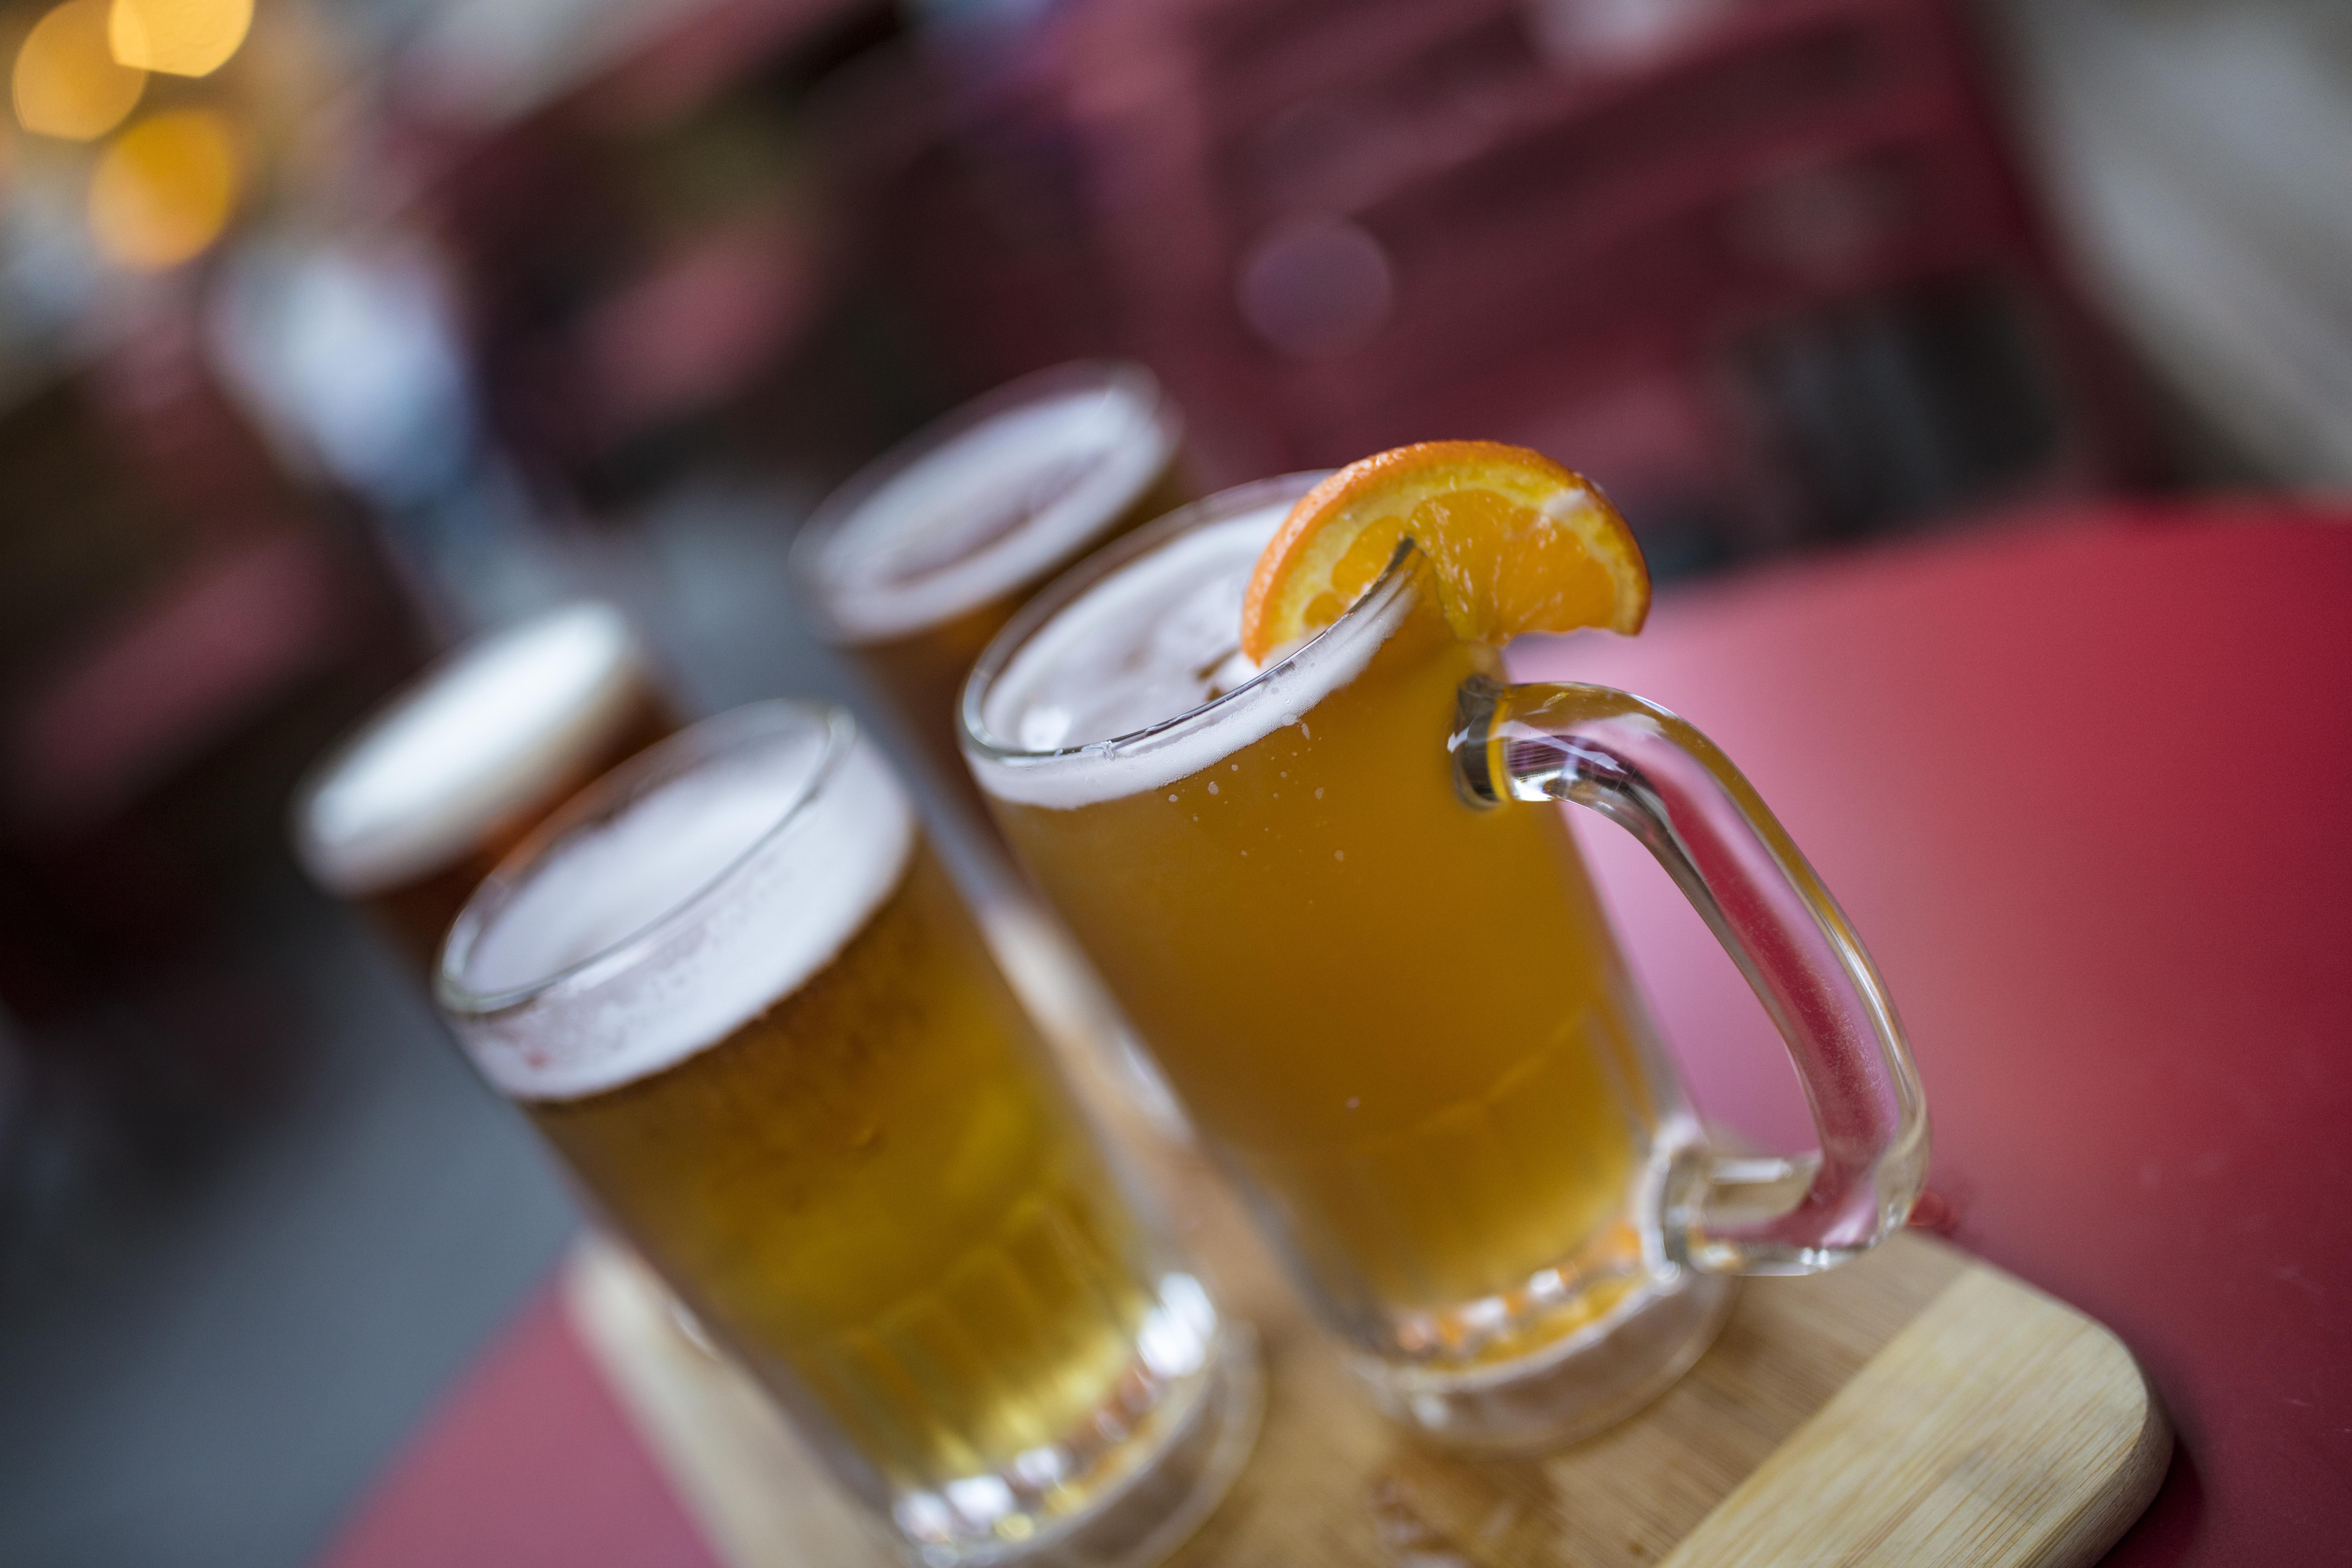 Refreshing Summer drink concept.